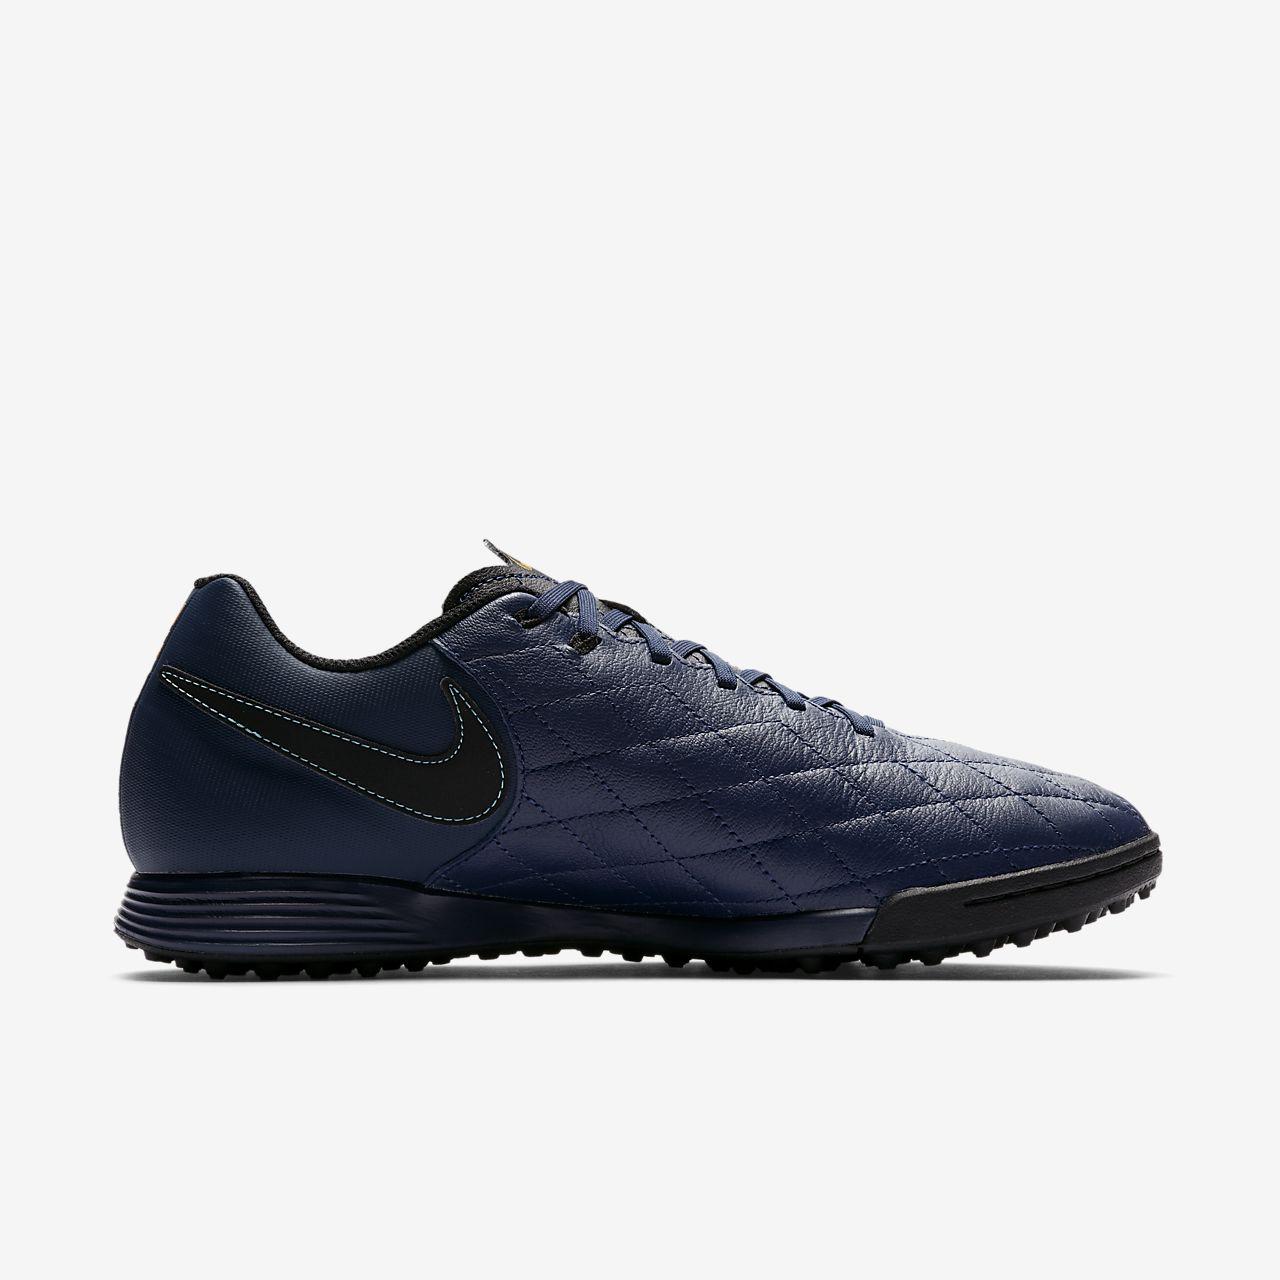 ... Nike TiempoX Ligera IV 10R TF Artificial-Turf Football Boot